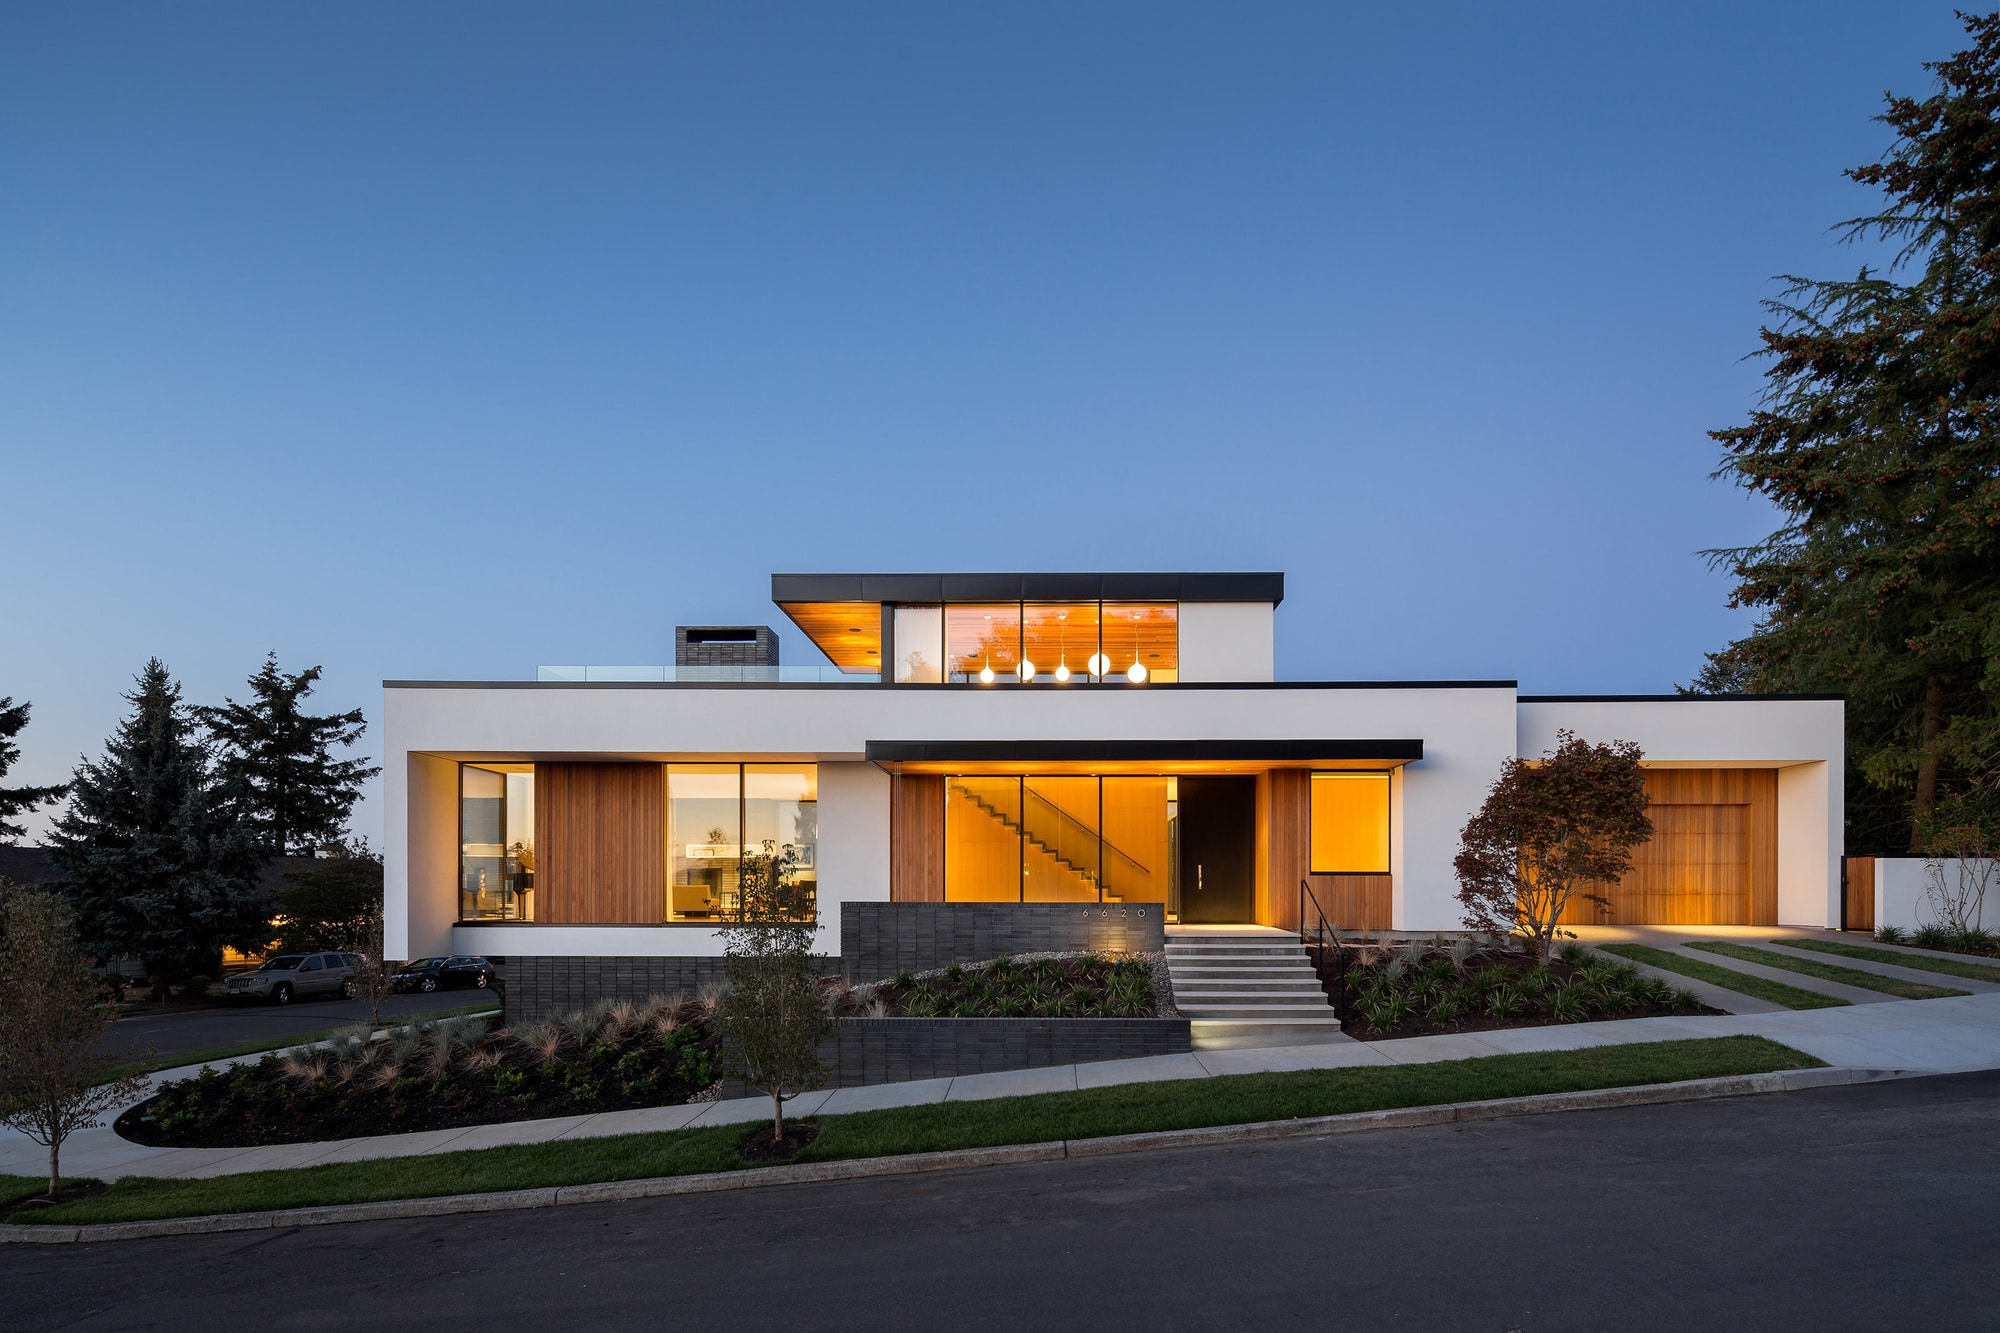 Dise o de casa de un piso moderna planos - Oggettistica moderna per la casa ...